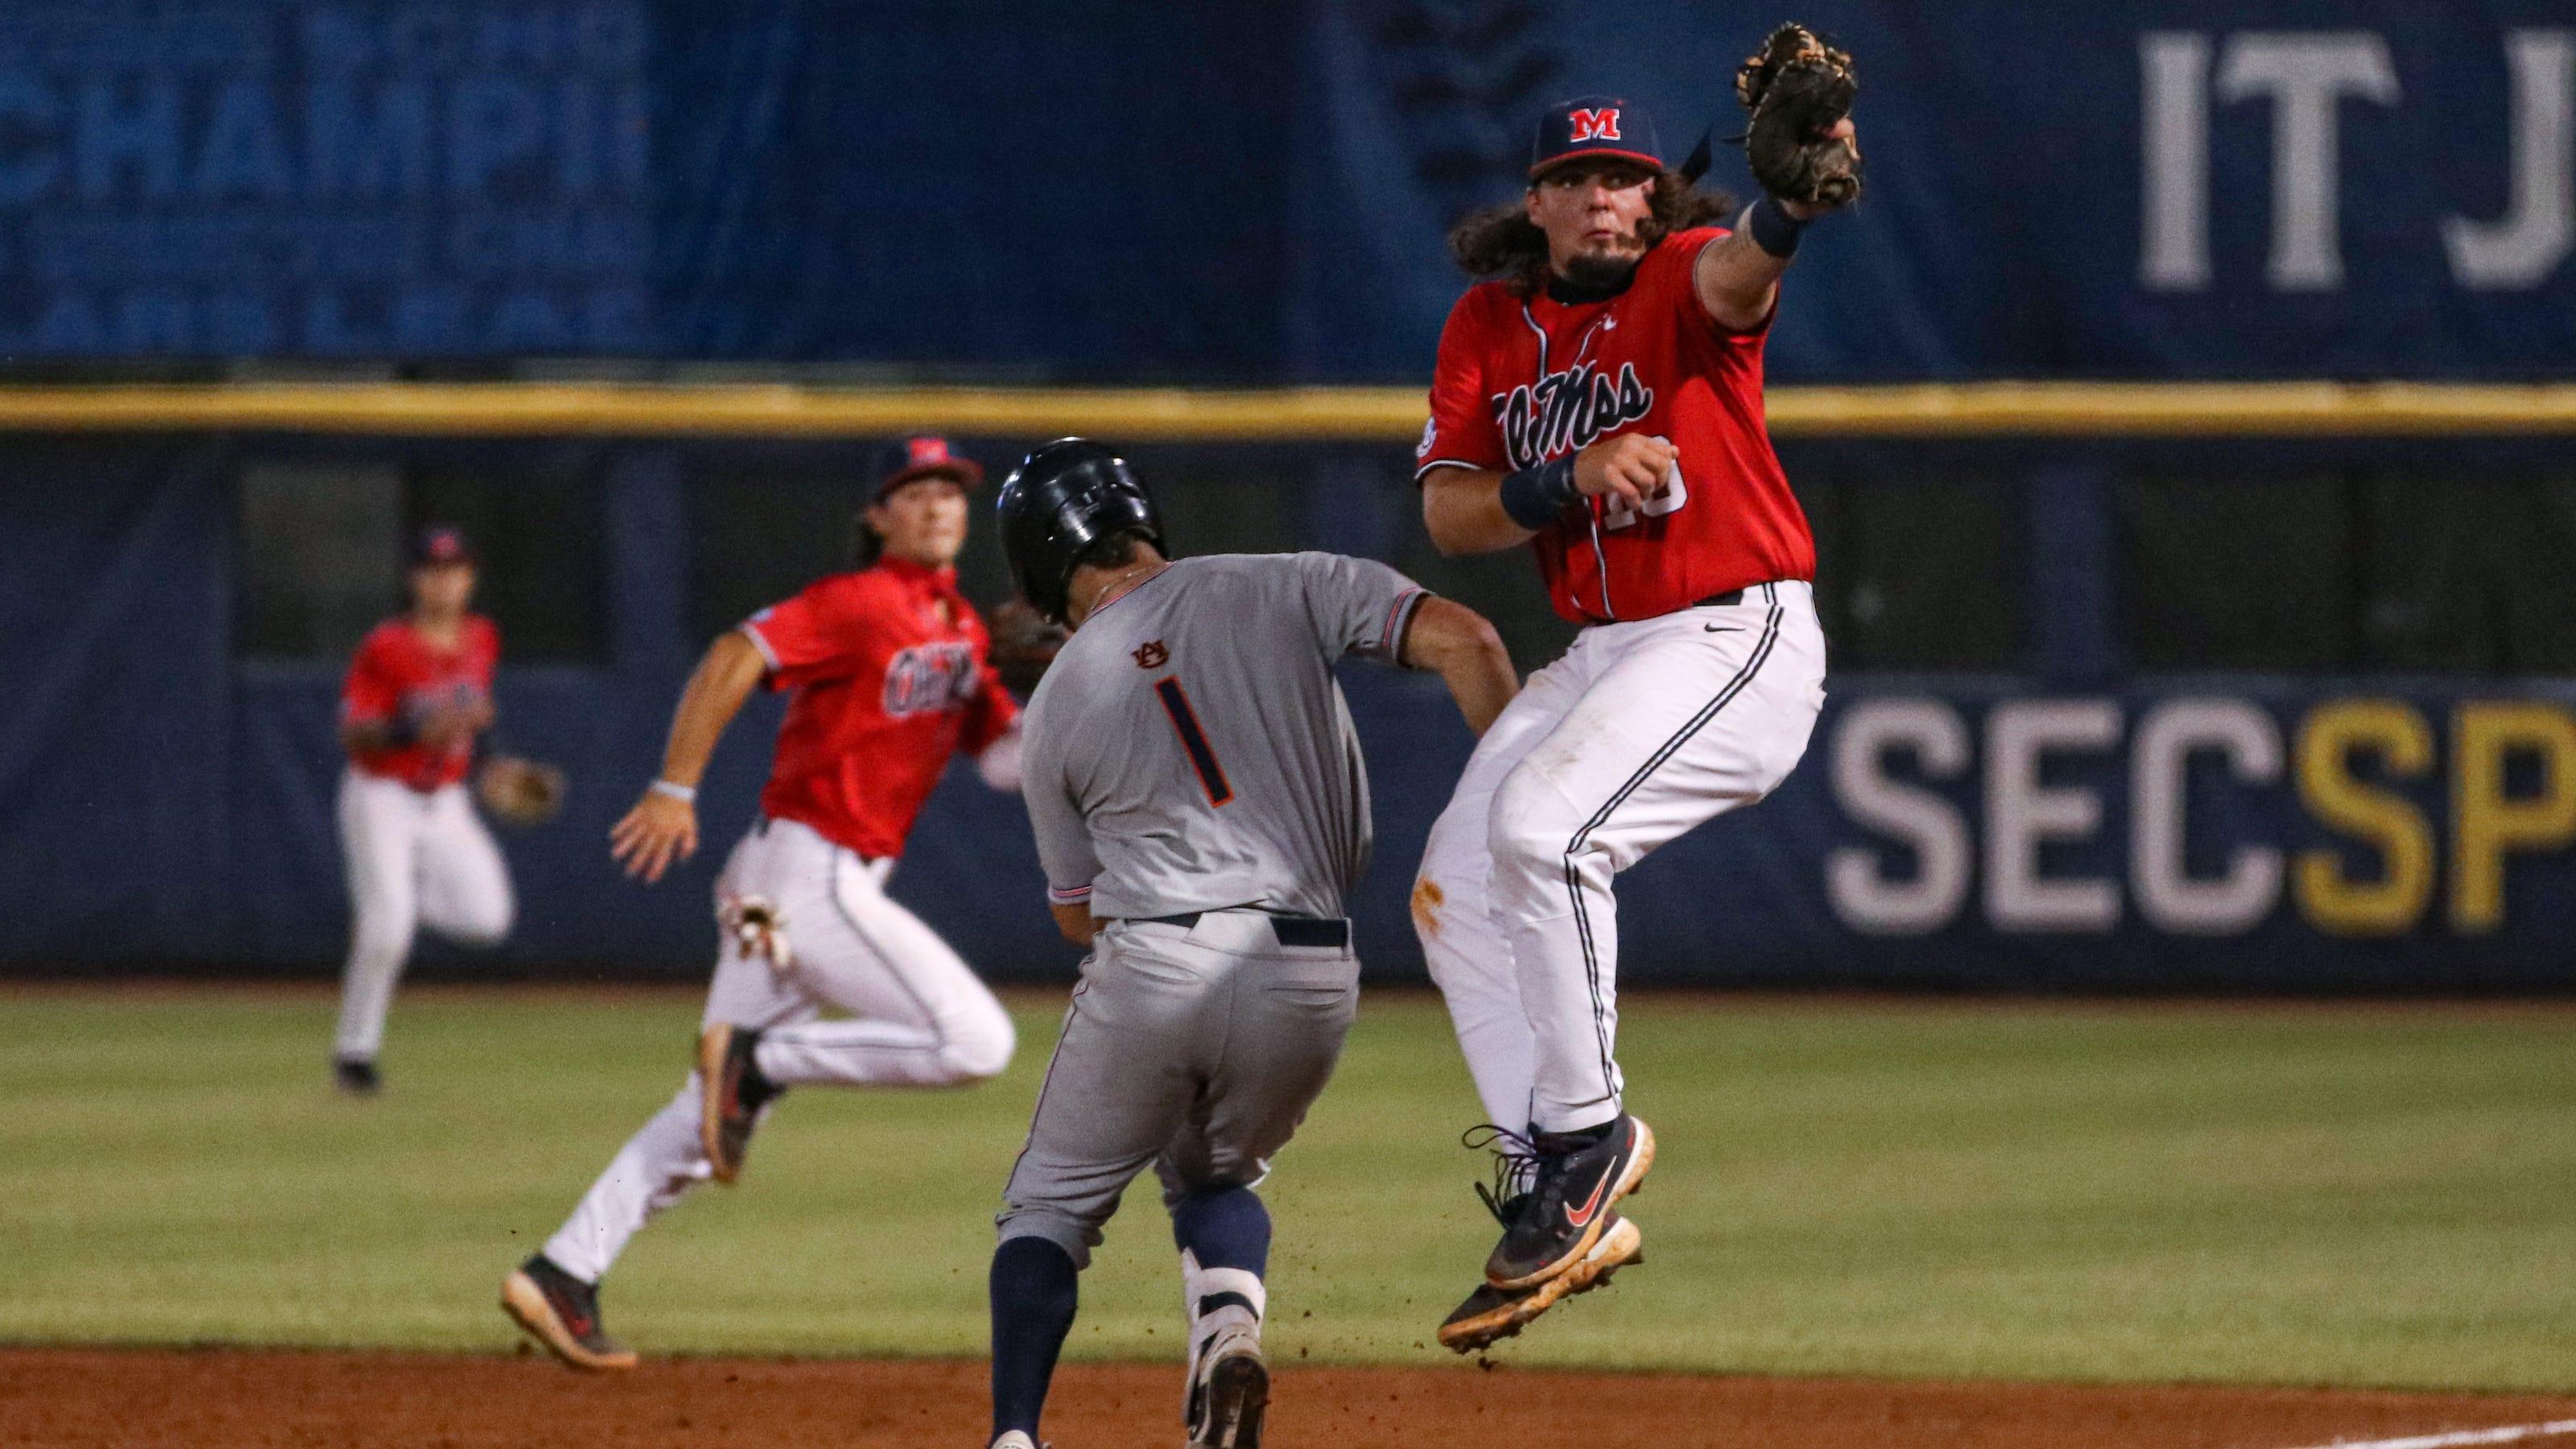 Ole Miss vs. Auburn baseball video highlights, final score in 2021 SEC Tournament